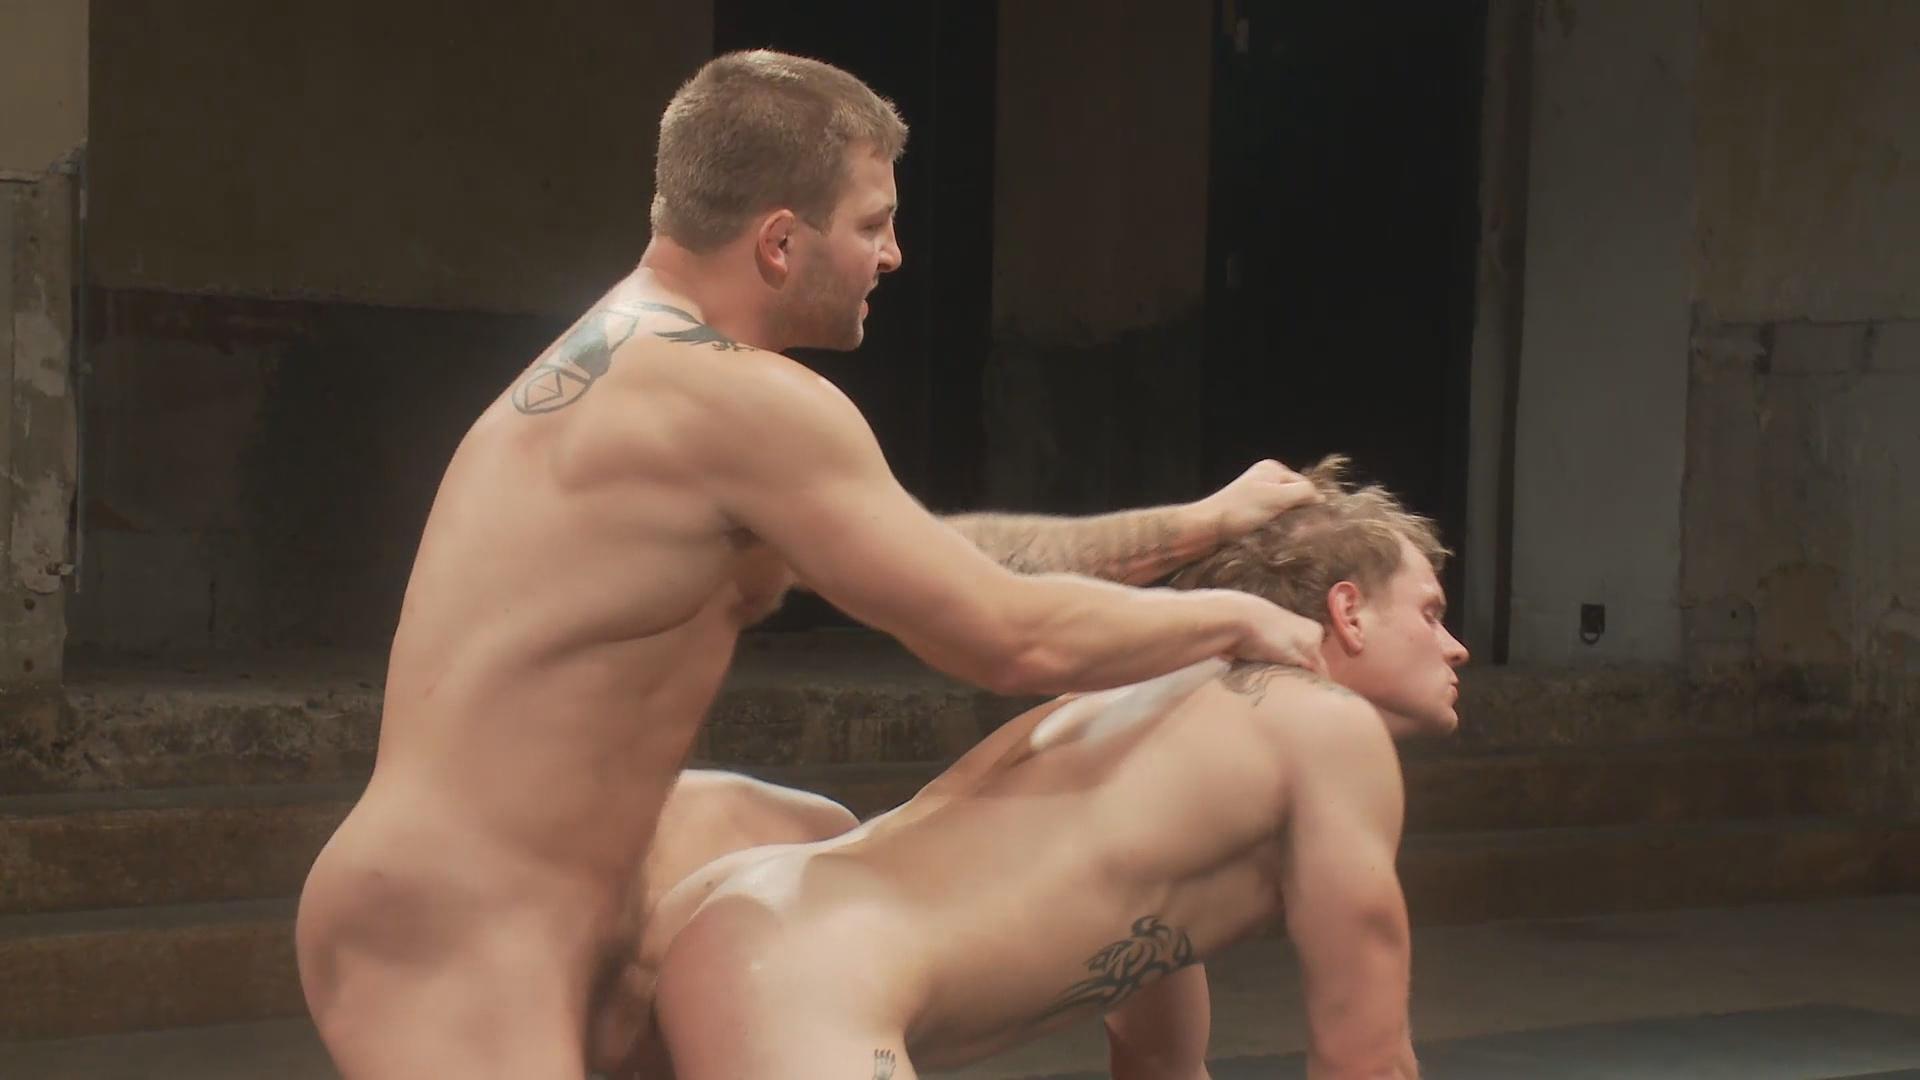 Wrestling gay porn stars